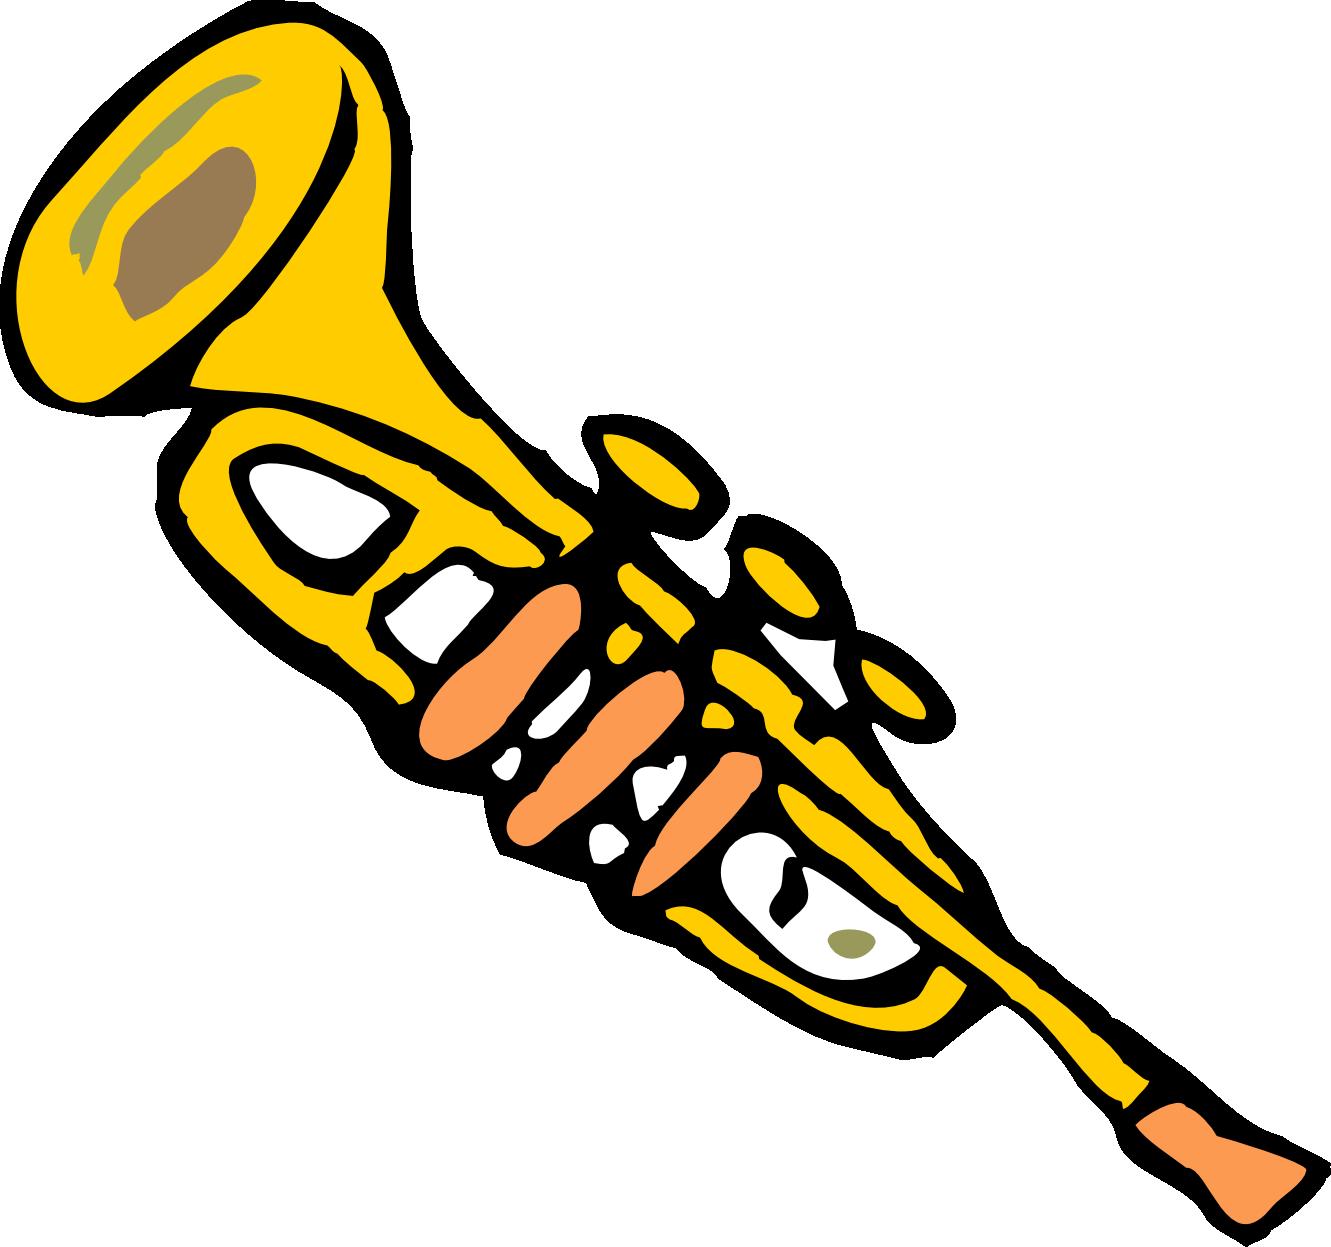 1331x1247 Upright Piano Cartoon 438132 Royalty Free Rf Clip Art Illustration